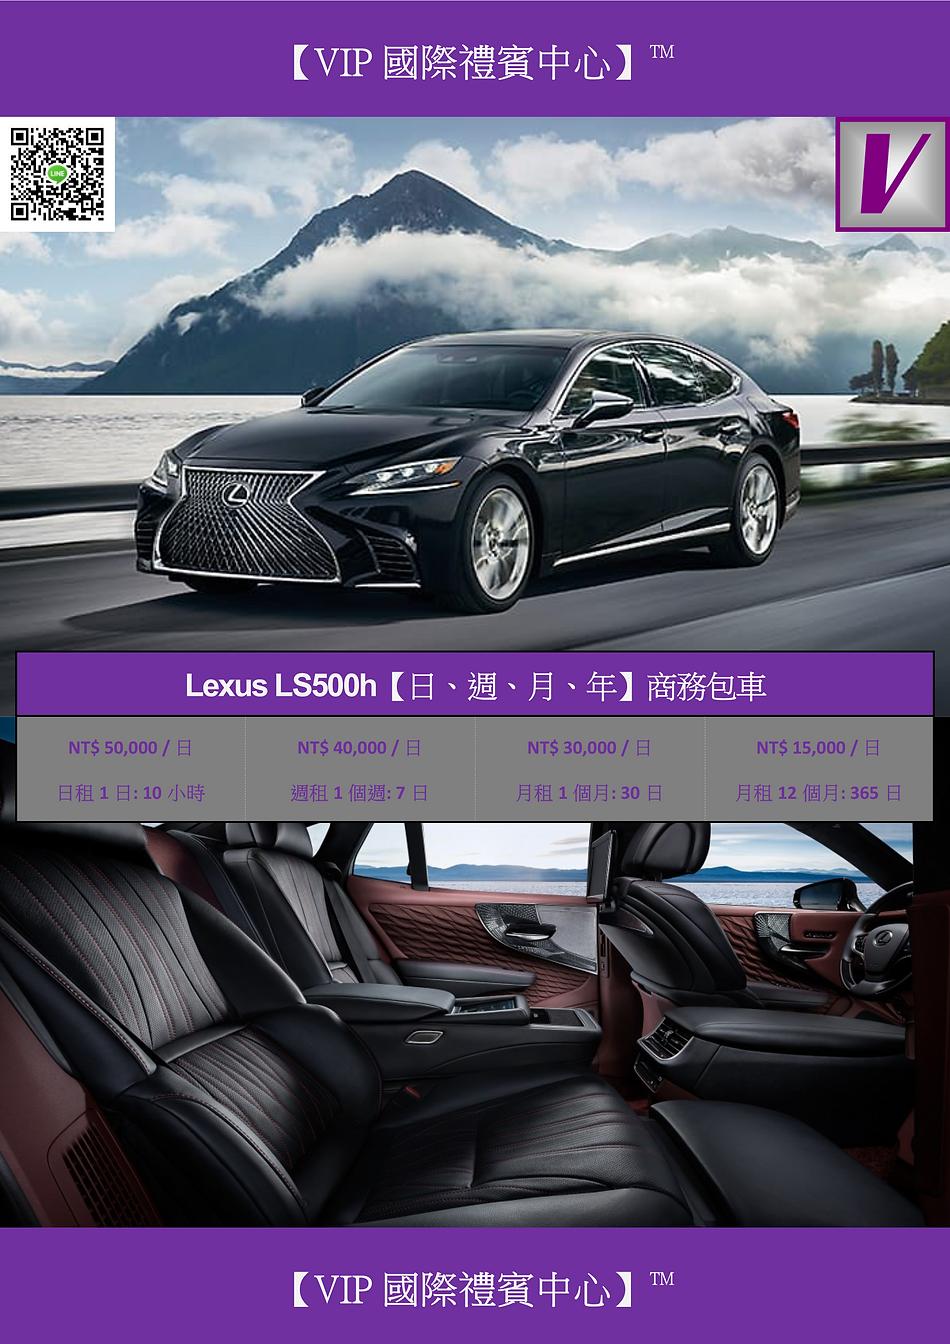 VIP國際禮賓中心 LEXUS LS500h DM.png